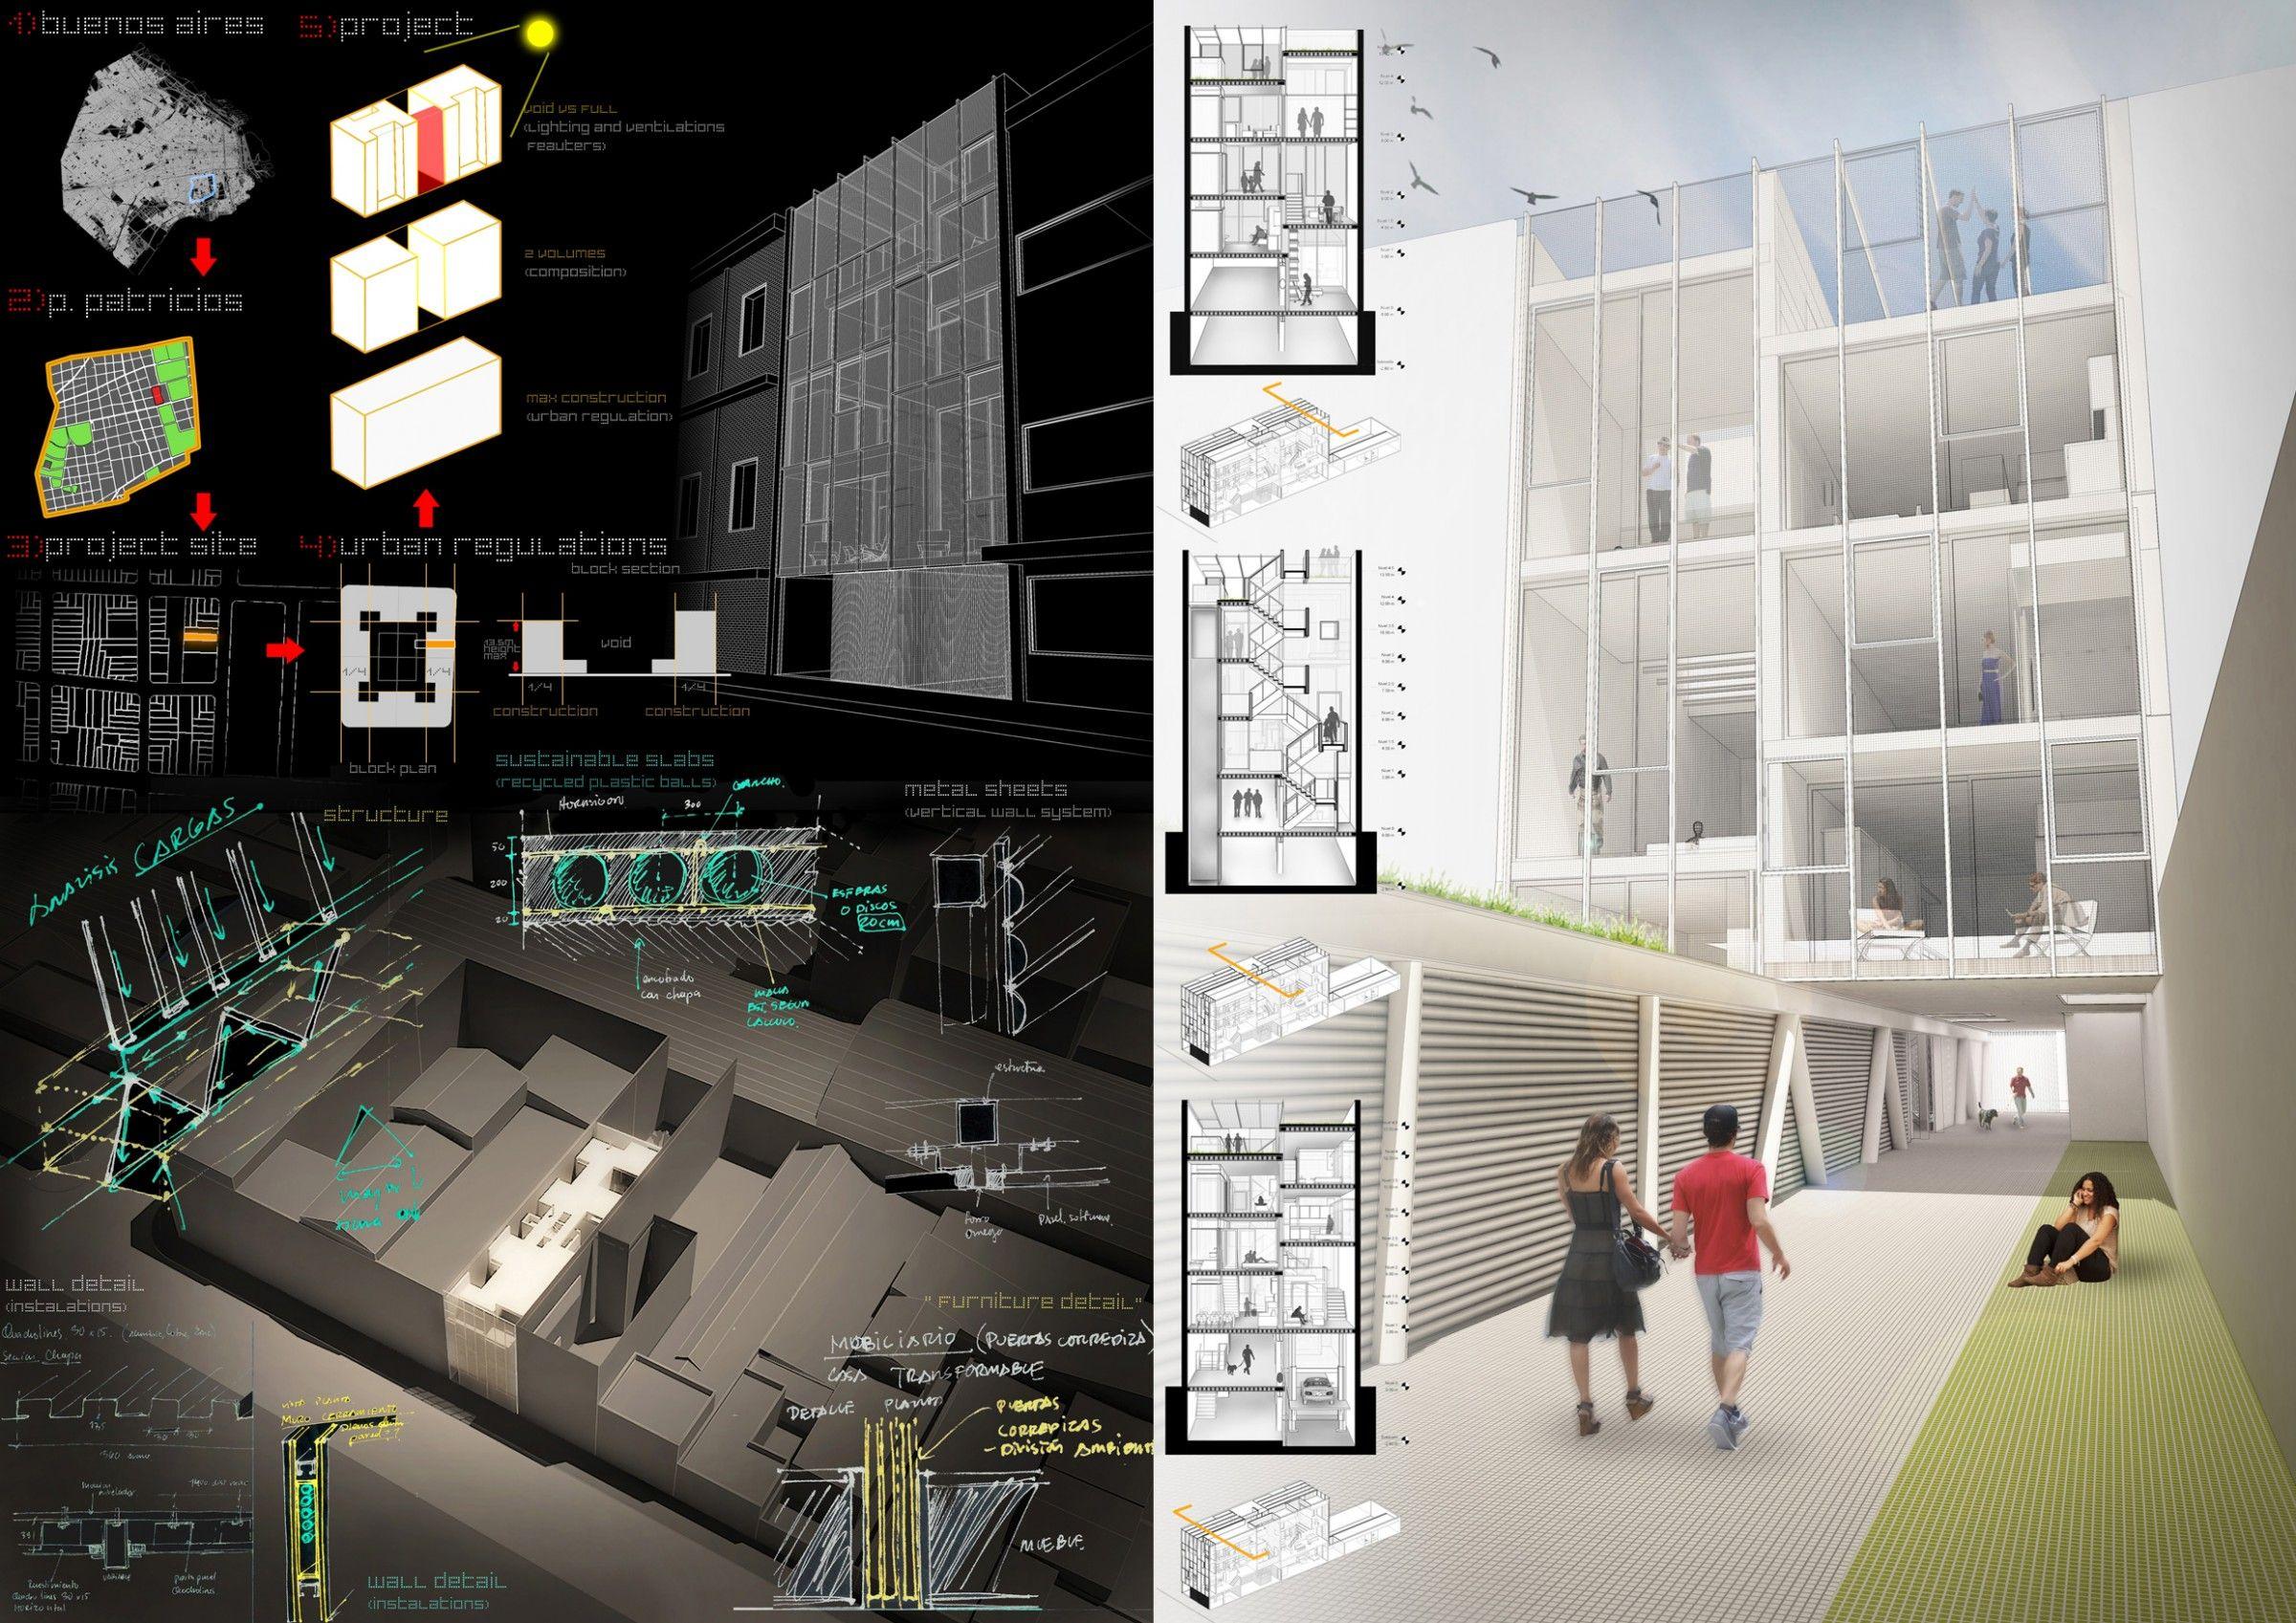 Archiprix 2013 / Flexible Urban Housing